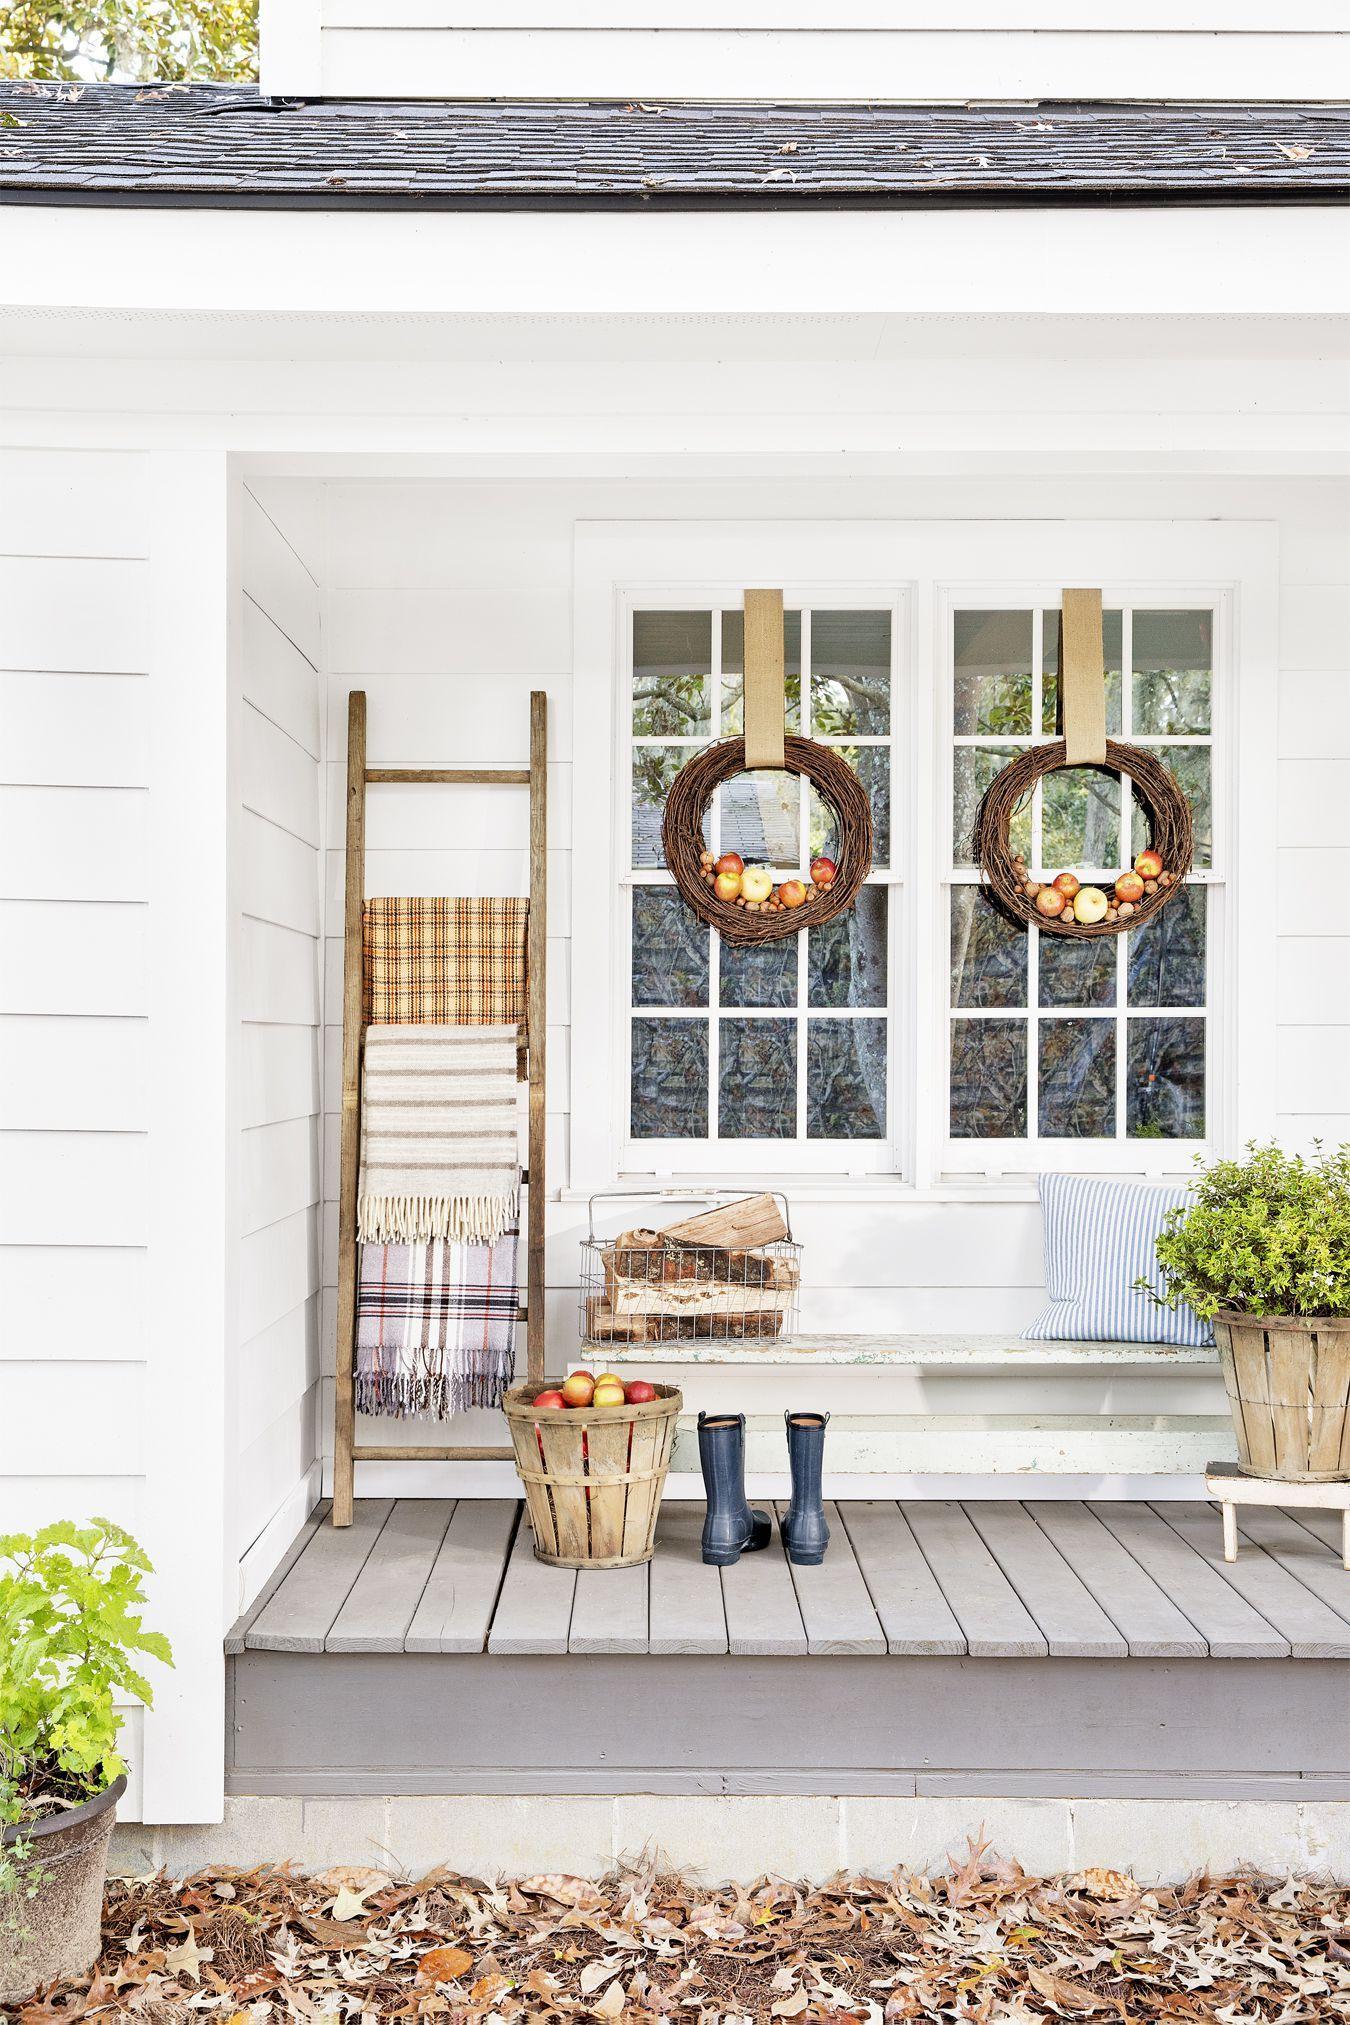 225 & 50 Fall Porch Decorating Ideas - Outdoor Fall Decor